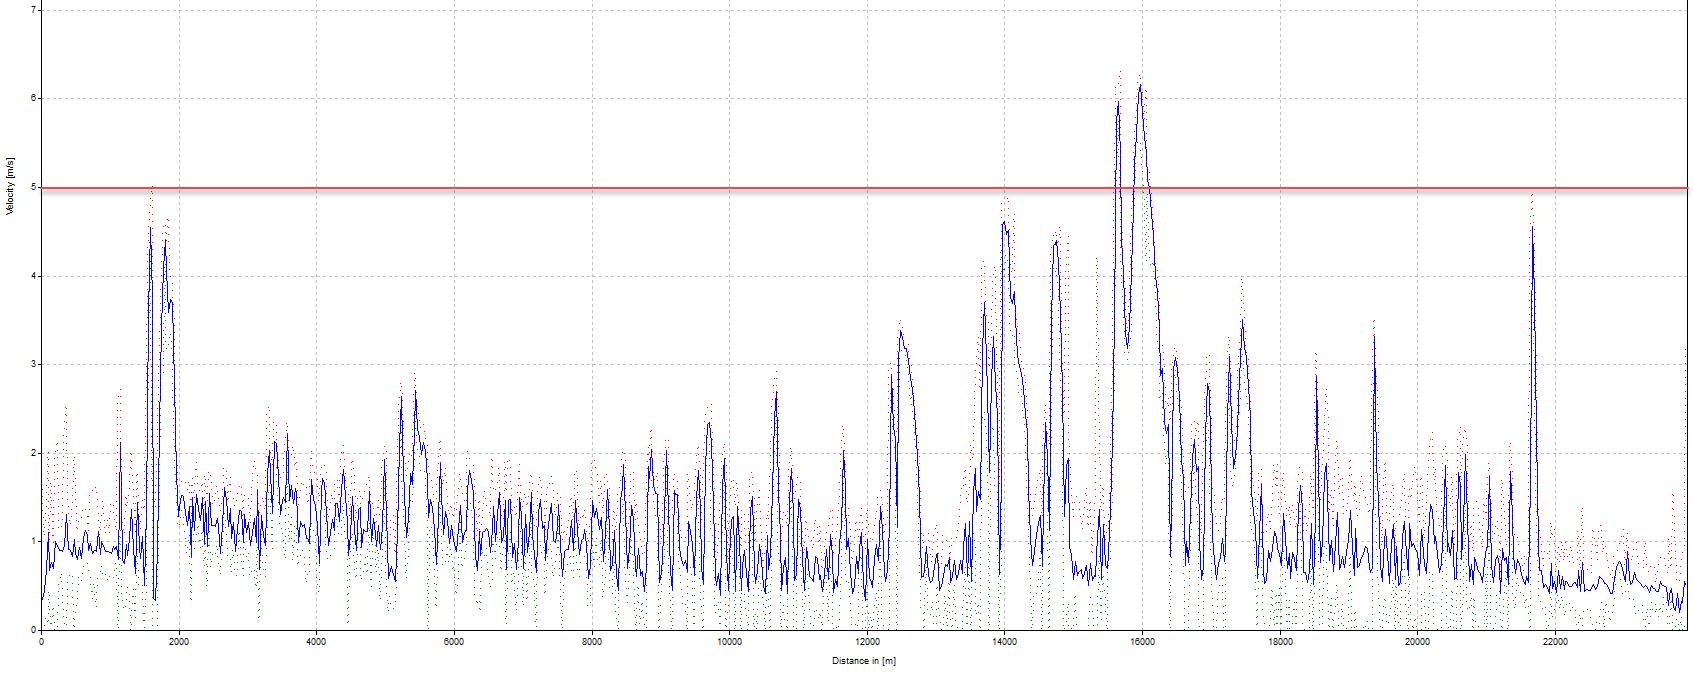 Figure 1: Tool Velocity (m/s) vs Log Distance (m)